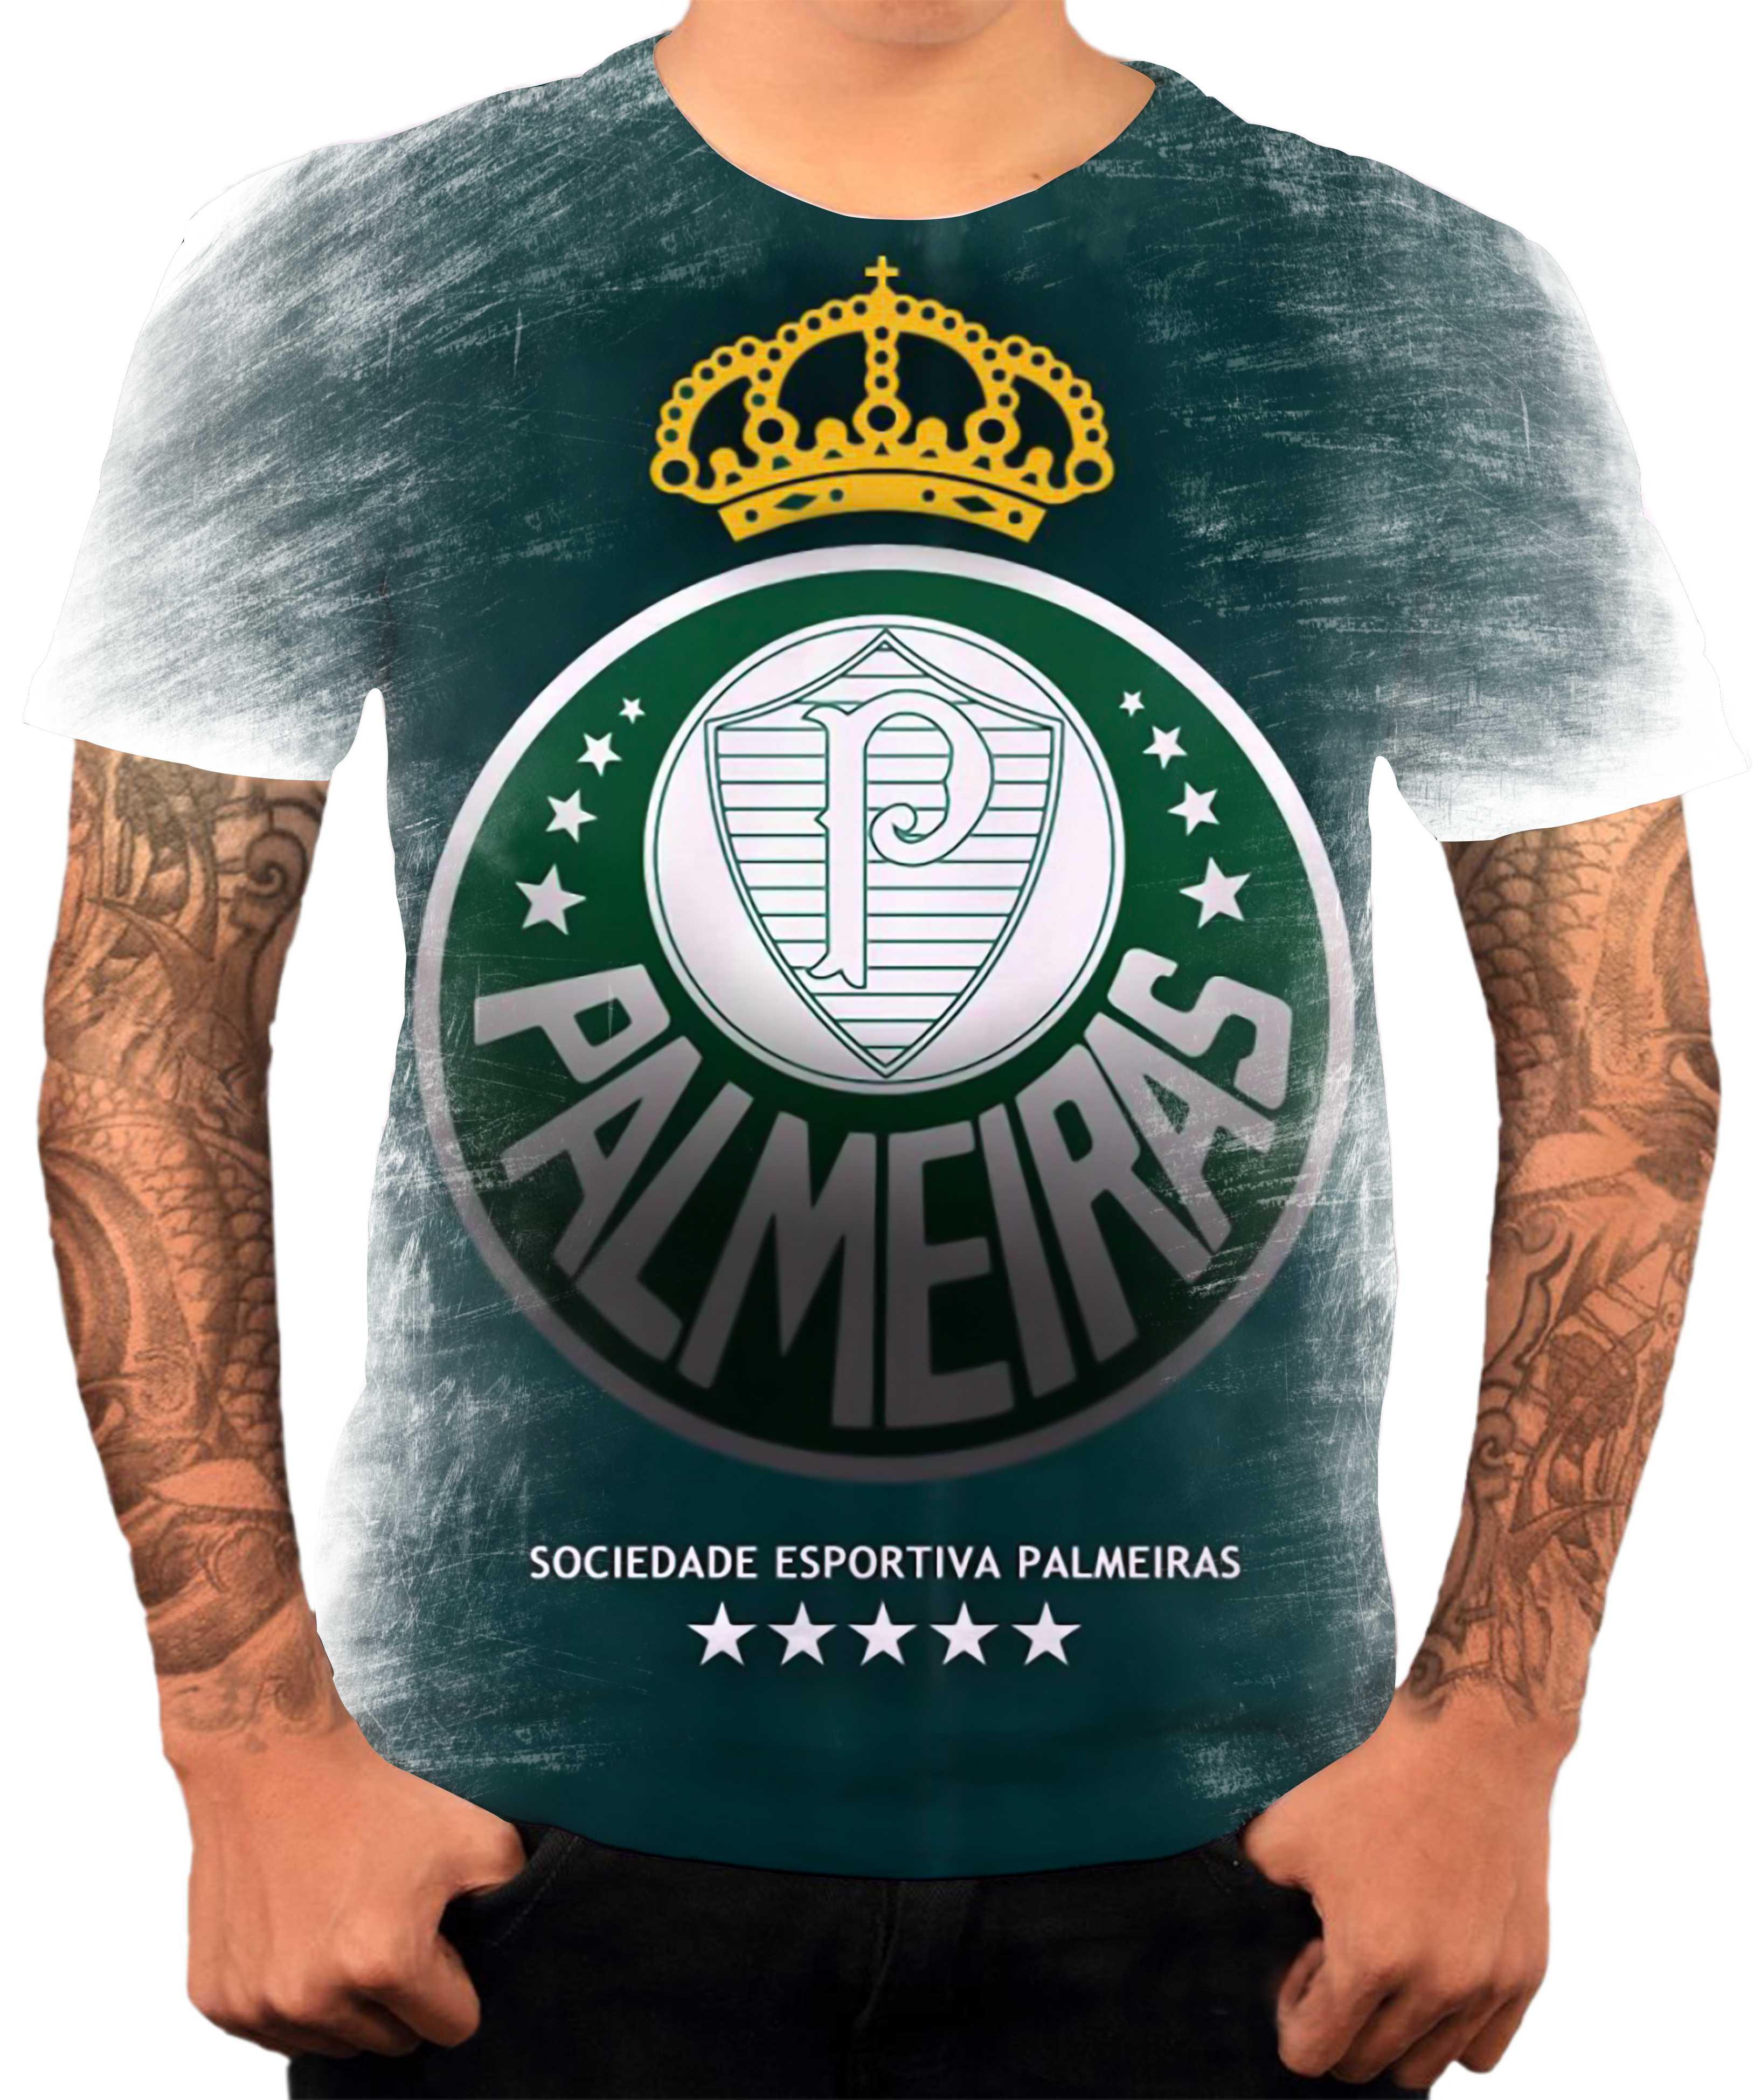 Almochaveiros Camisas de Times 1  35c00de15db03